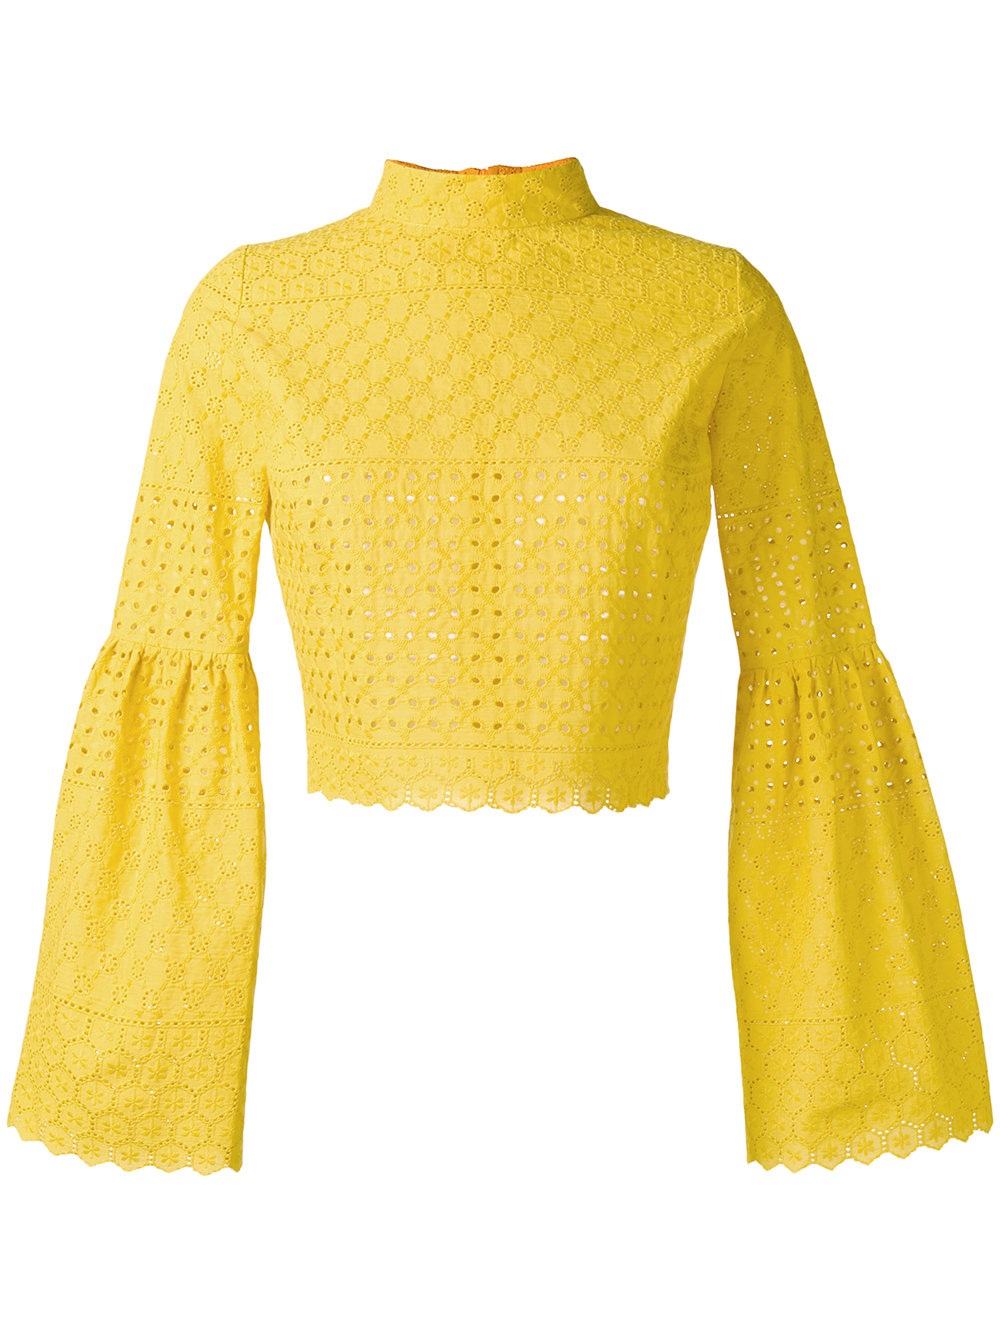 $305.68 - DAIZY SHELY bell sleeve blouse